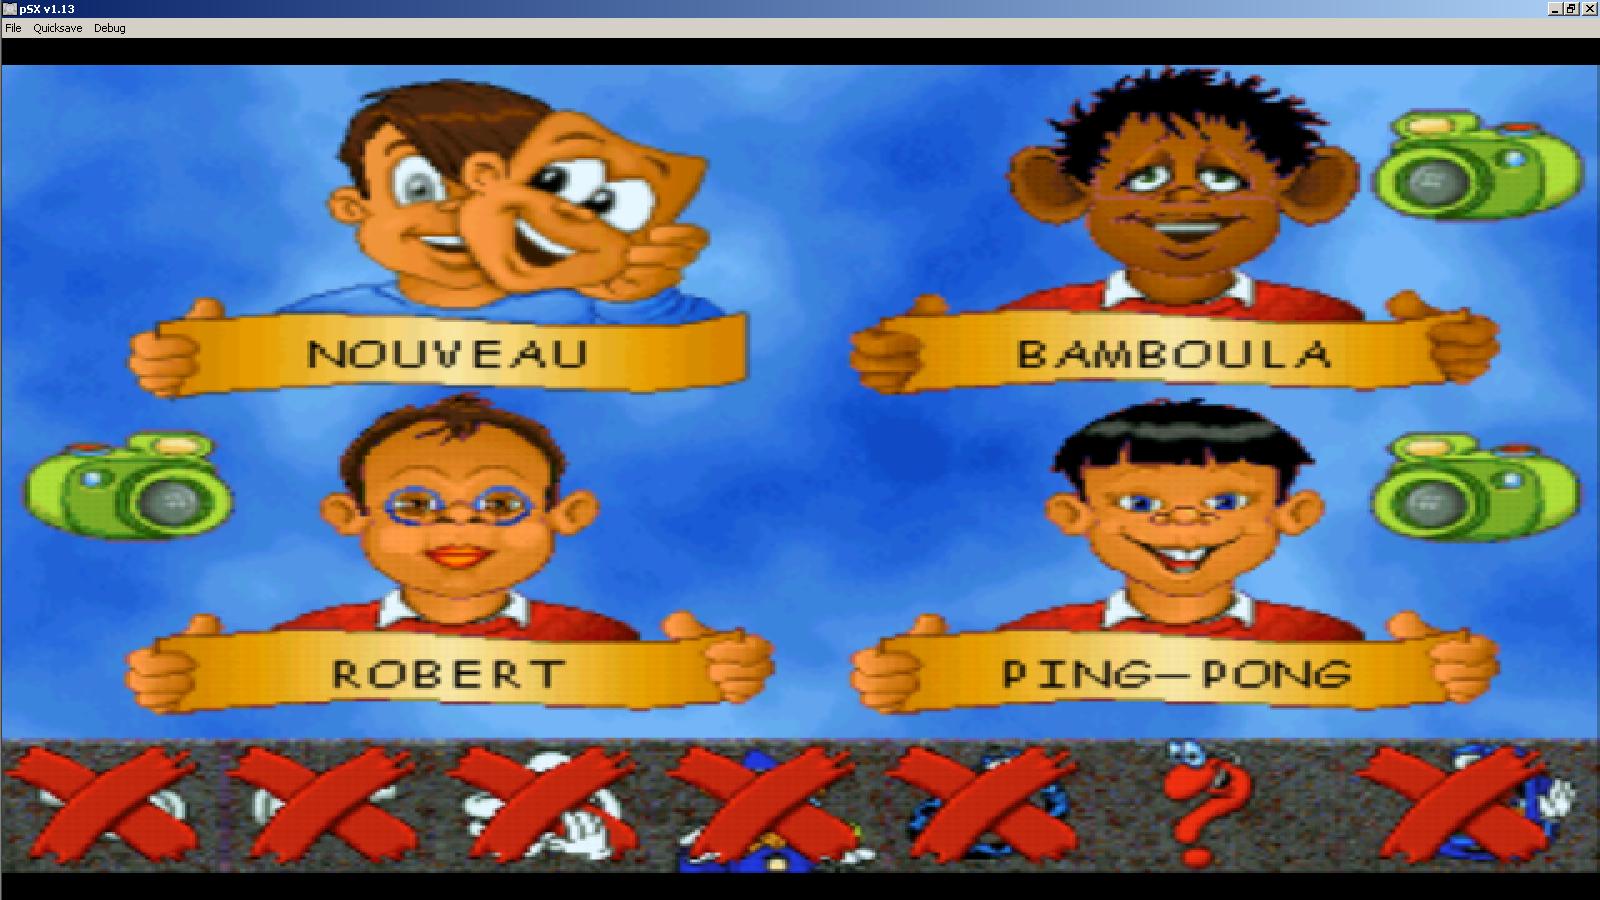 Adibou = Jeu Raciste Sur Le Forum Blabla 18-25 Ans - 02-07 tout Jeu Pc Adibou